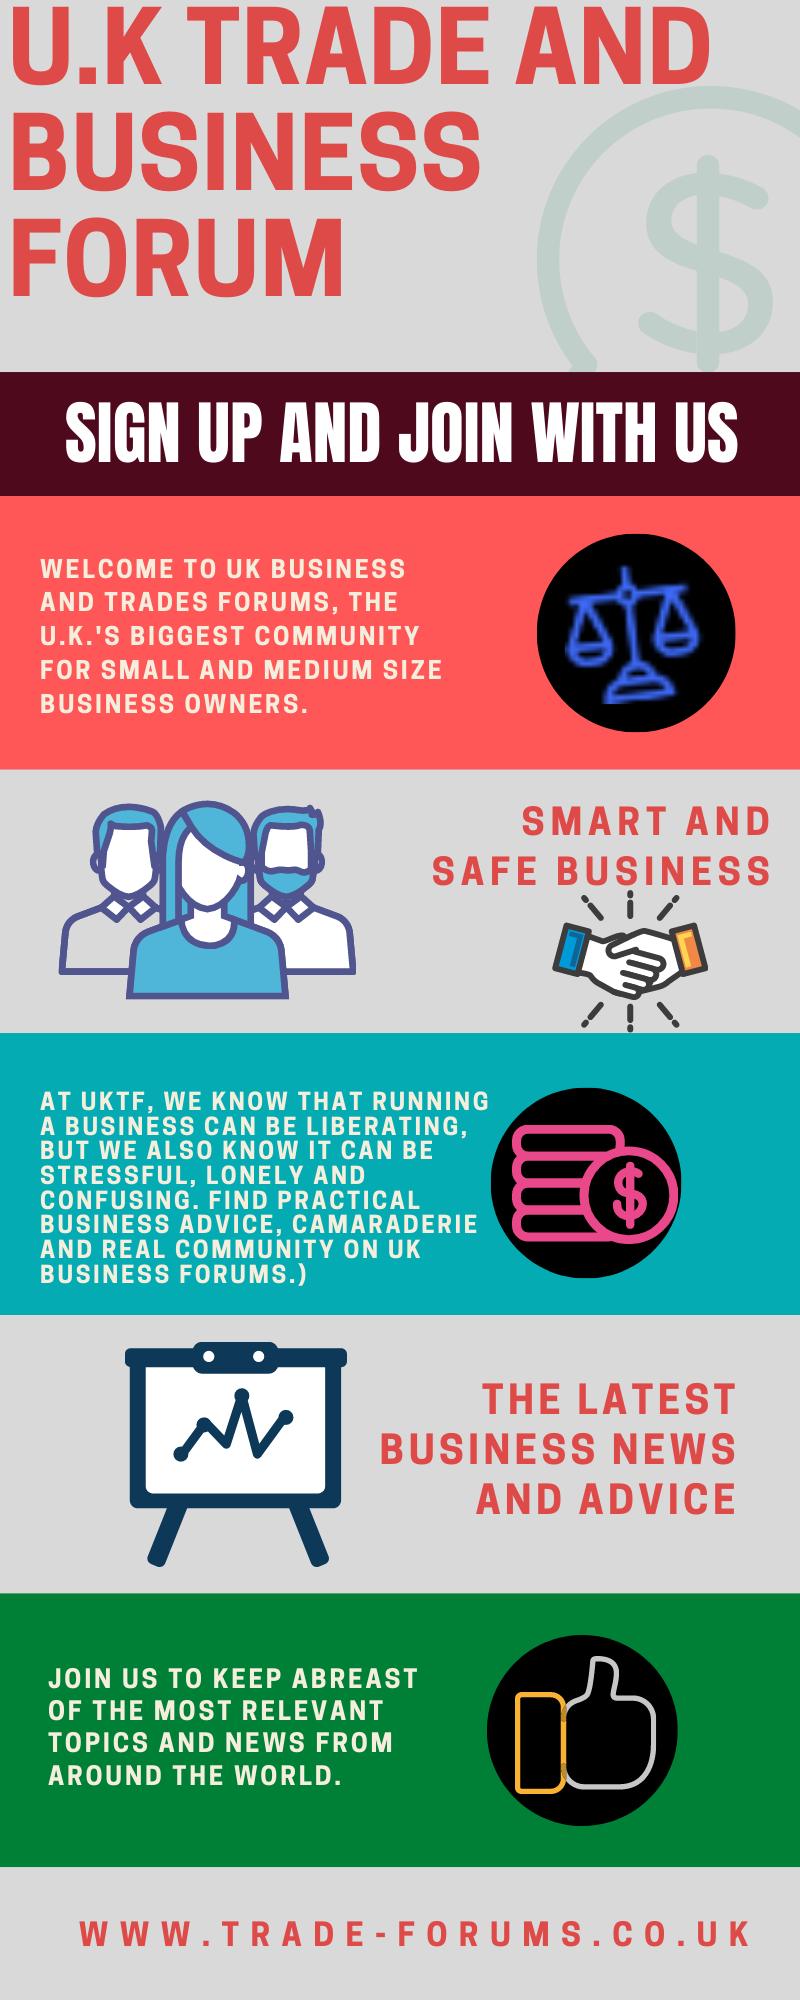 U.K Trade And Business Forum